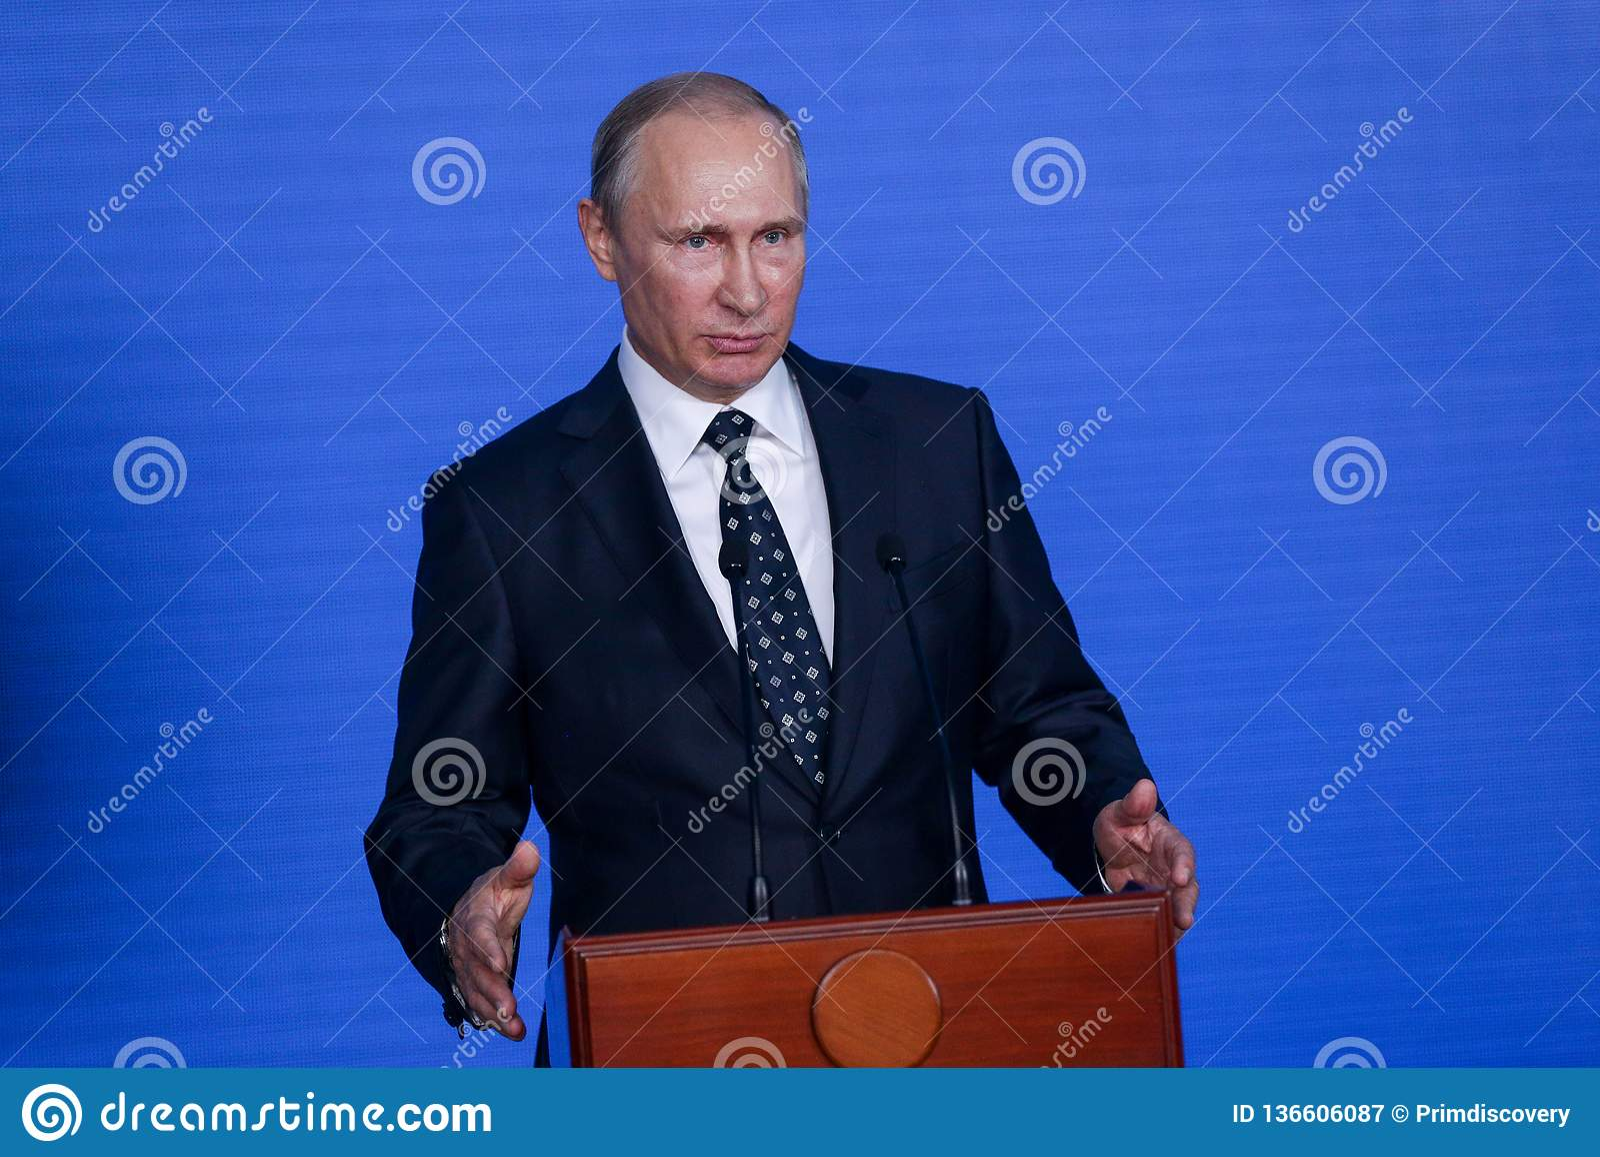 Speech by the President of the Russian Federation Vladimir Putin in the Primorsky Oceanarium